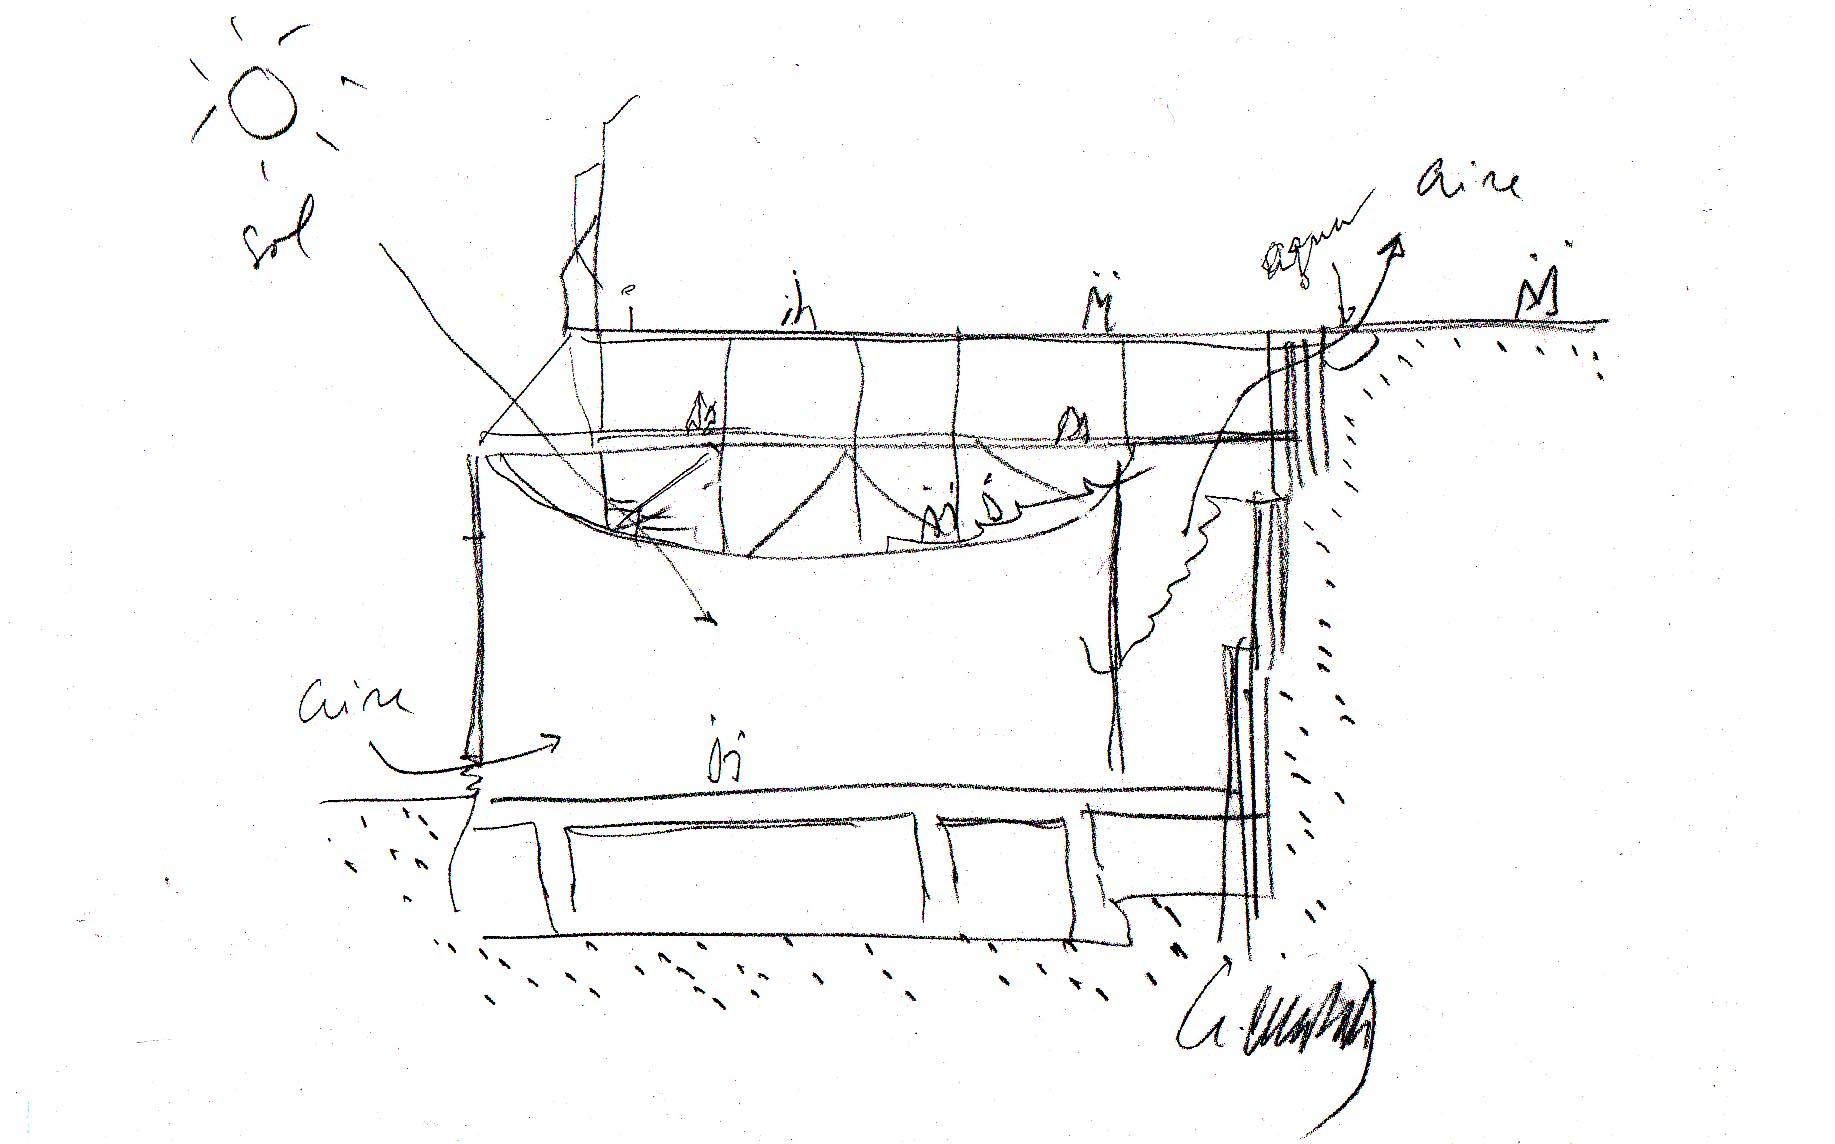 Eduardo chillida bailar sobre arquitectura for Oficina abierta definicion